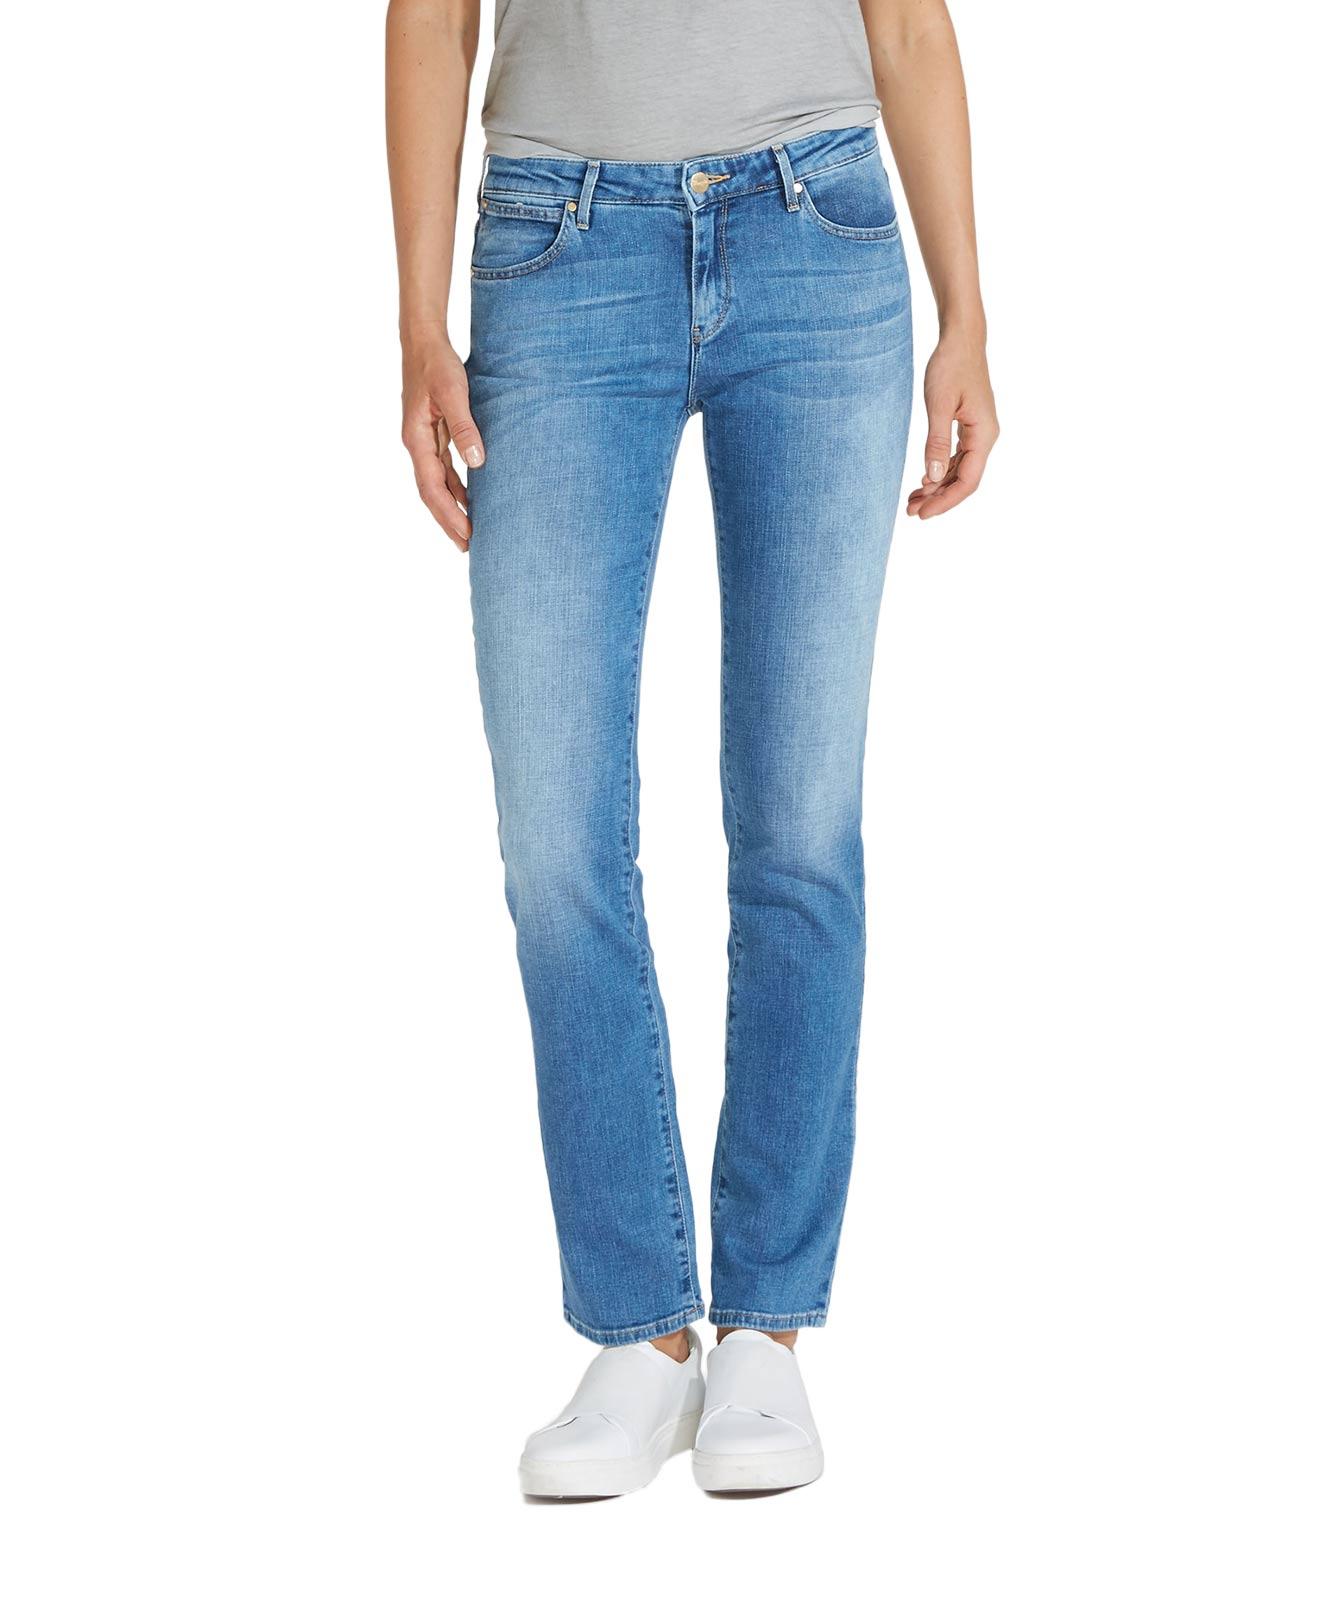 Hosen für Frauen - WRANGLER STRAIGHT Jeans Body Bespoke Best Blue  - Onlineshop Jeans Meile